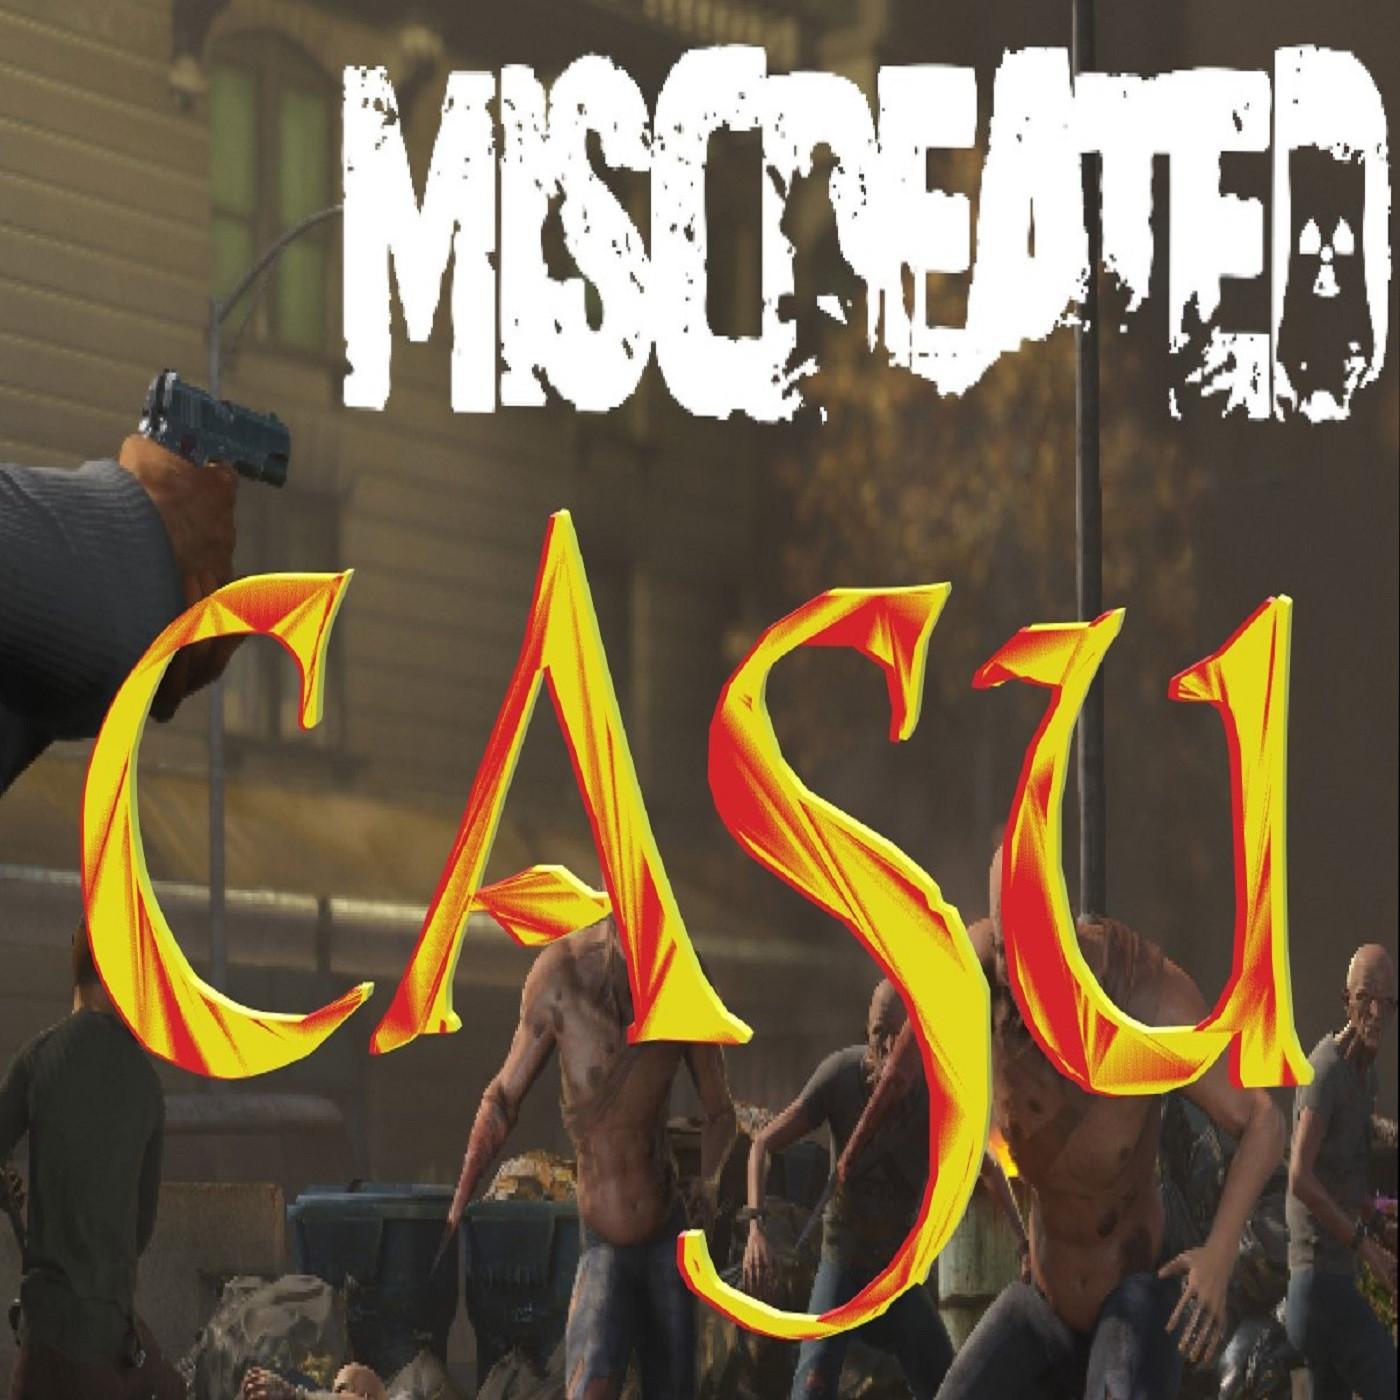 Miscreated (la survie devenue mission impossible ?)